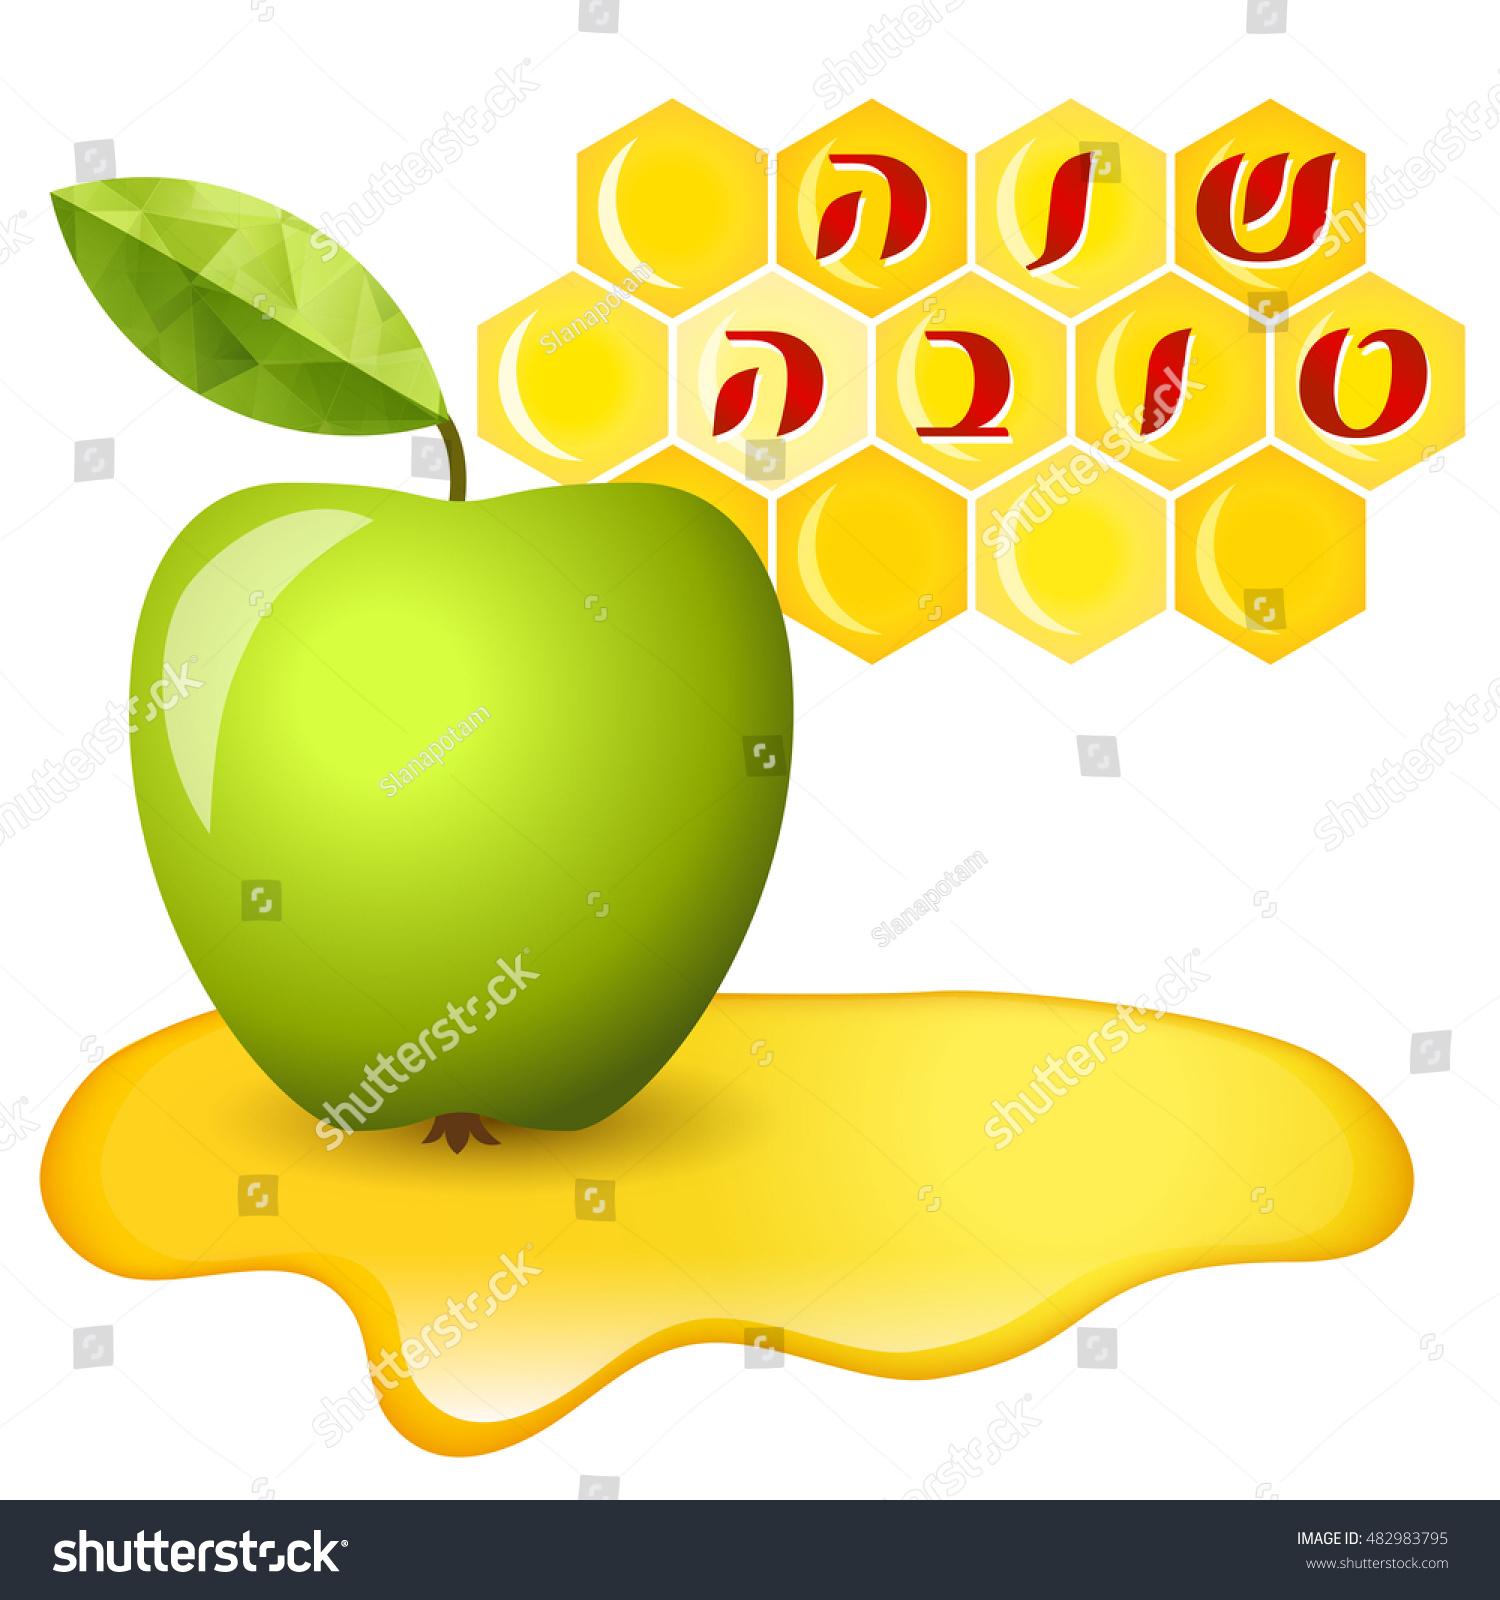 Green apple honey rosh hashana greeting stock vector 482983795 green apple and honey rosh hashana greeting card jewish new year greeting text kristyandbryce Images